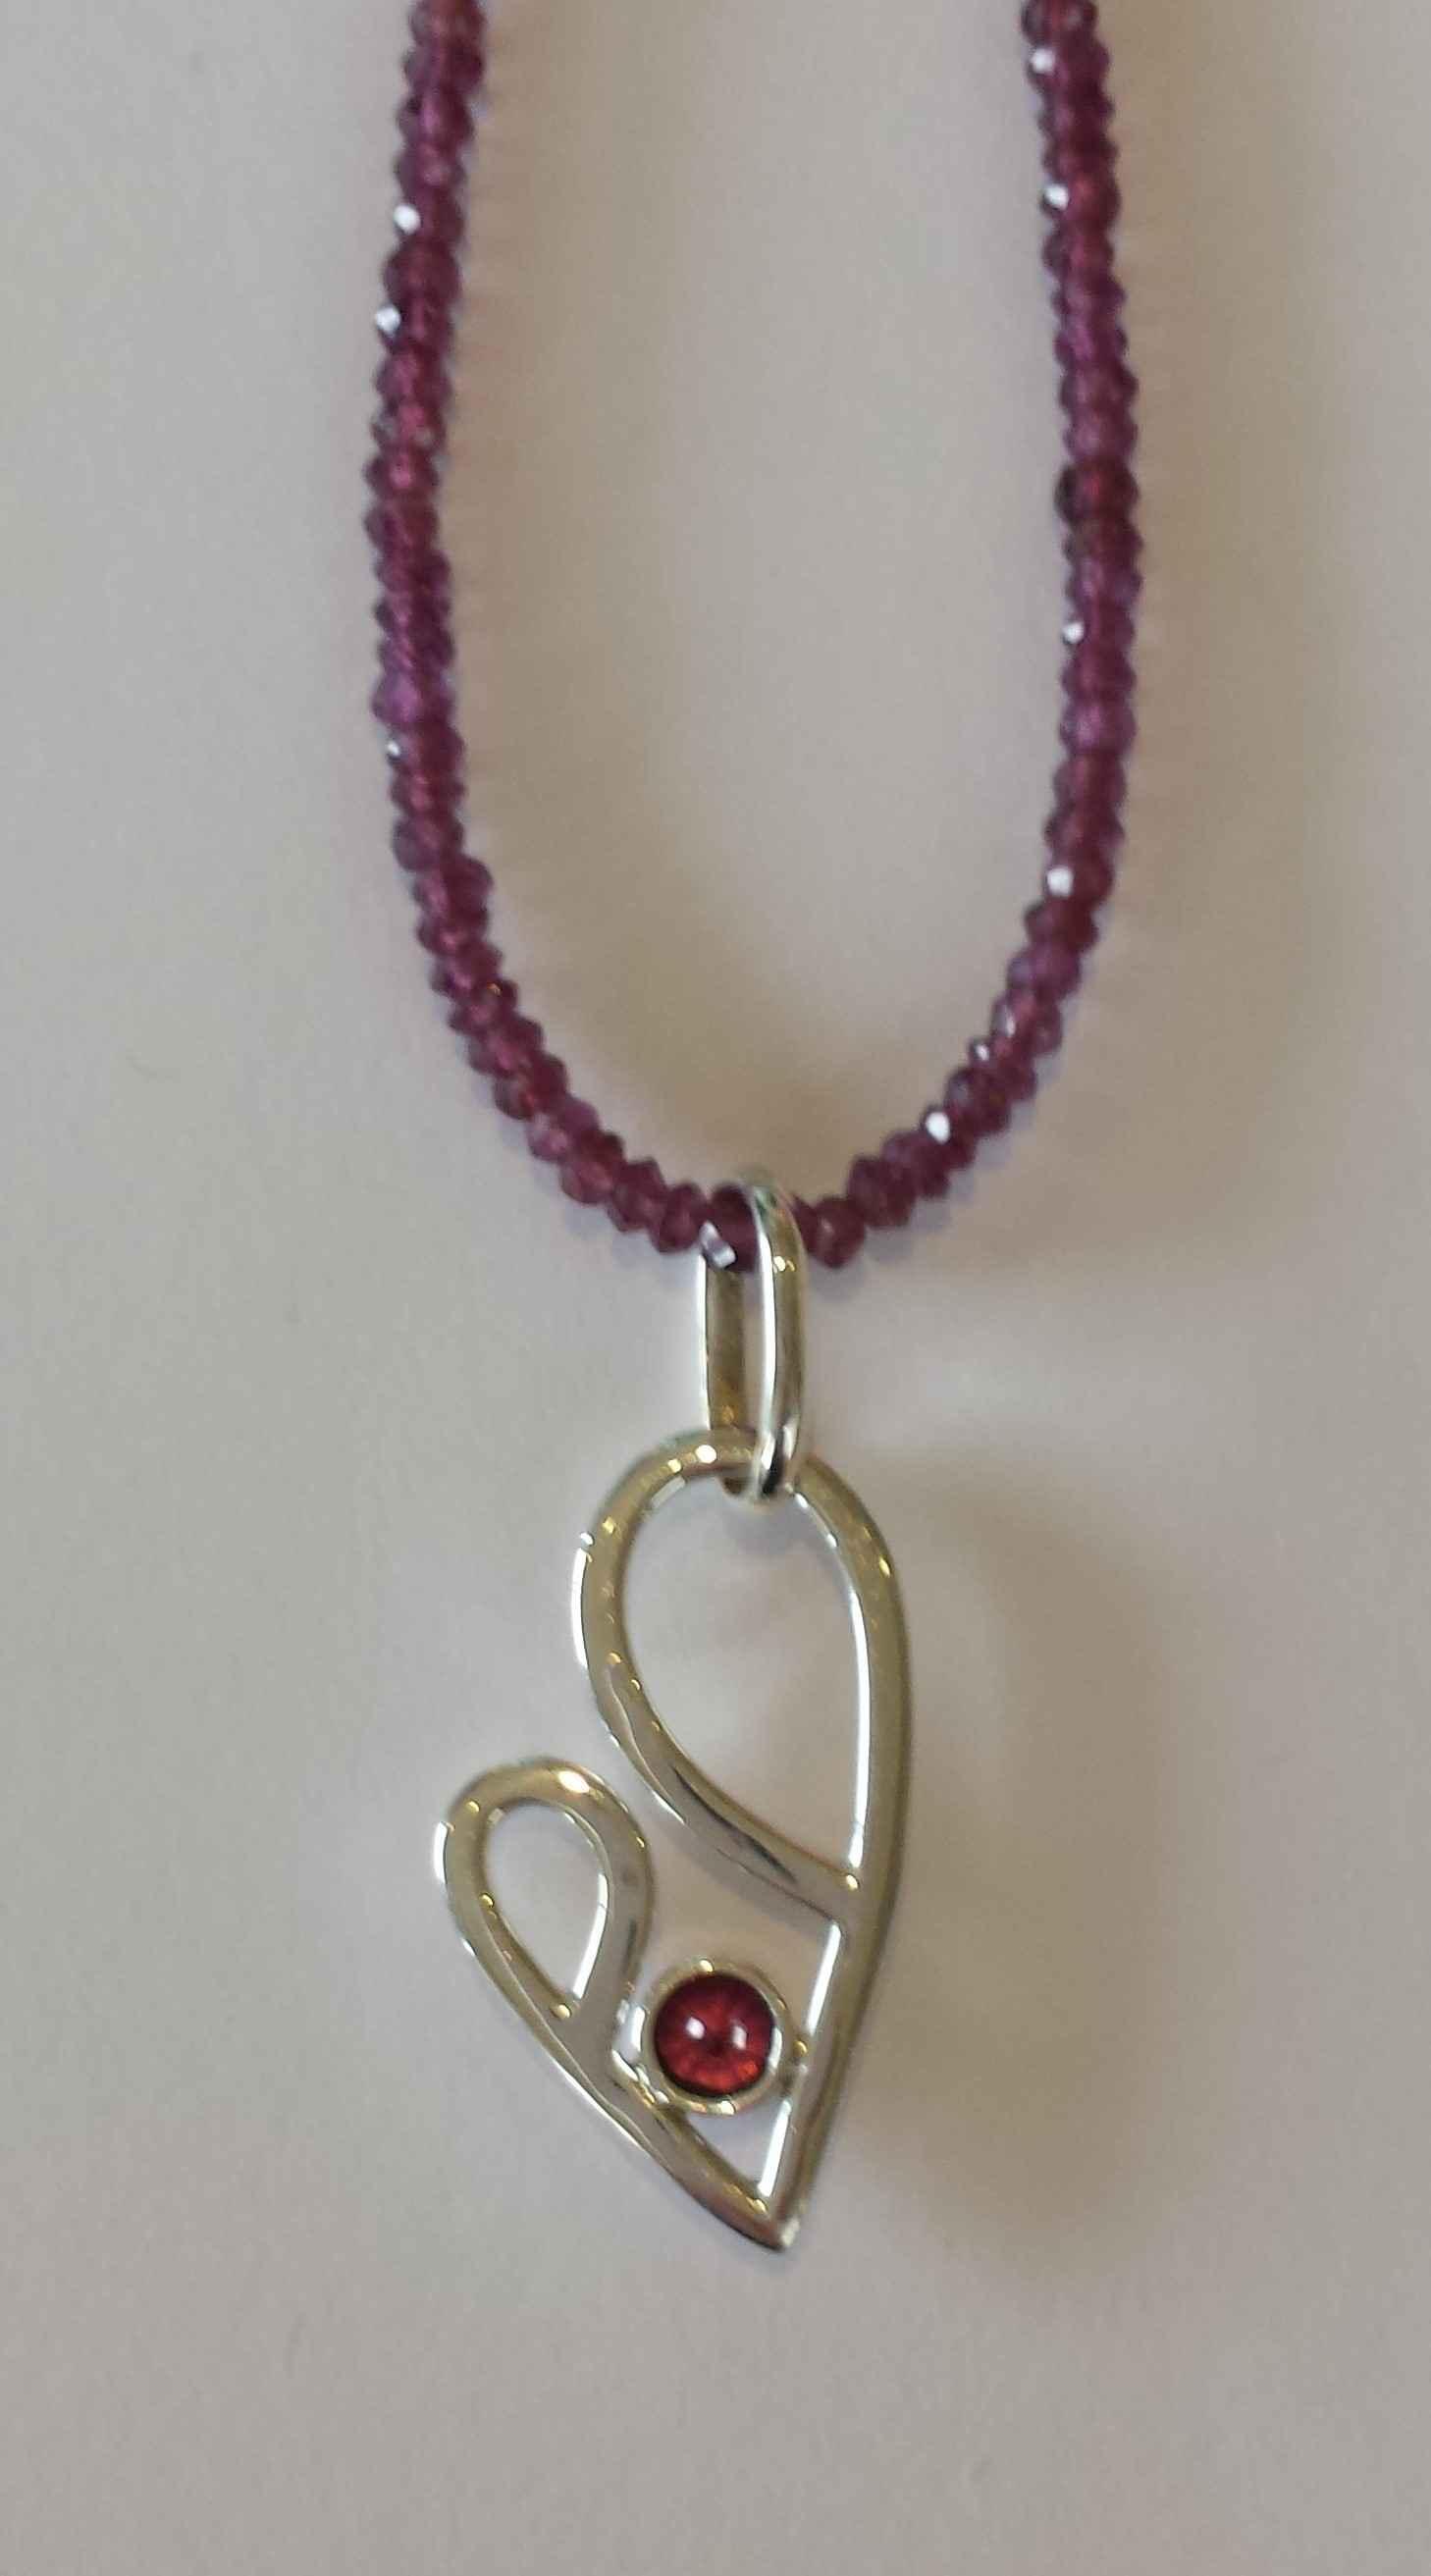 #21 Purple Garnet Bea... by Ms. Catherine Laing - Masterpiece Online